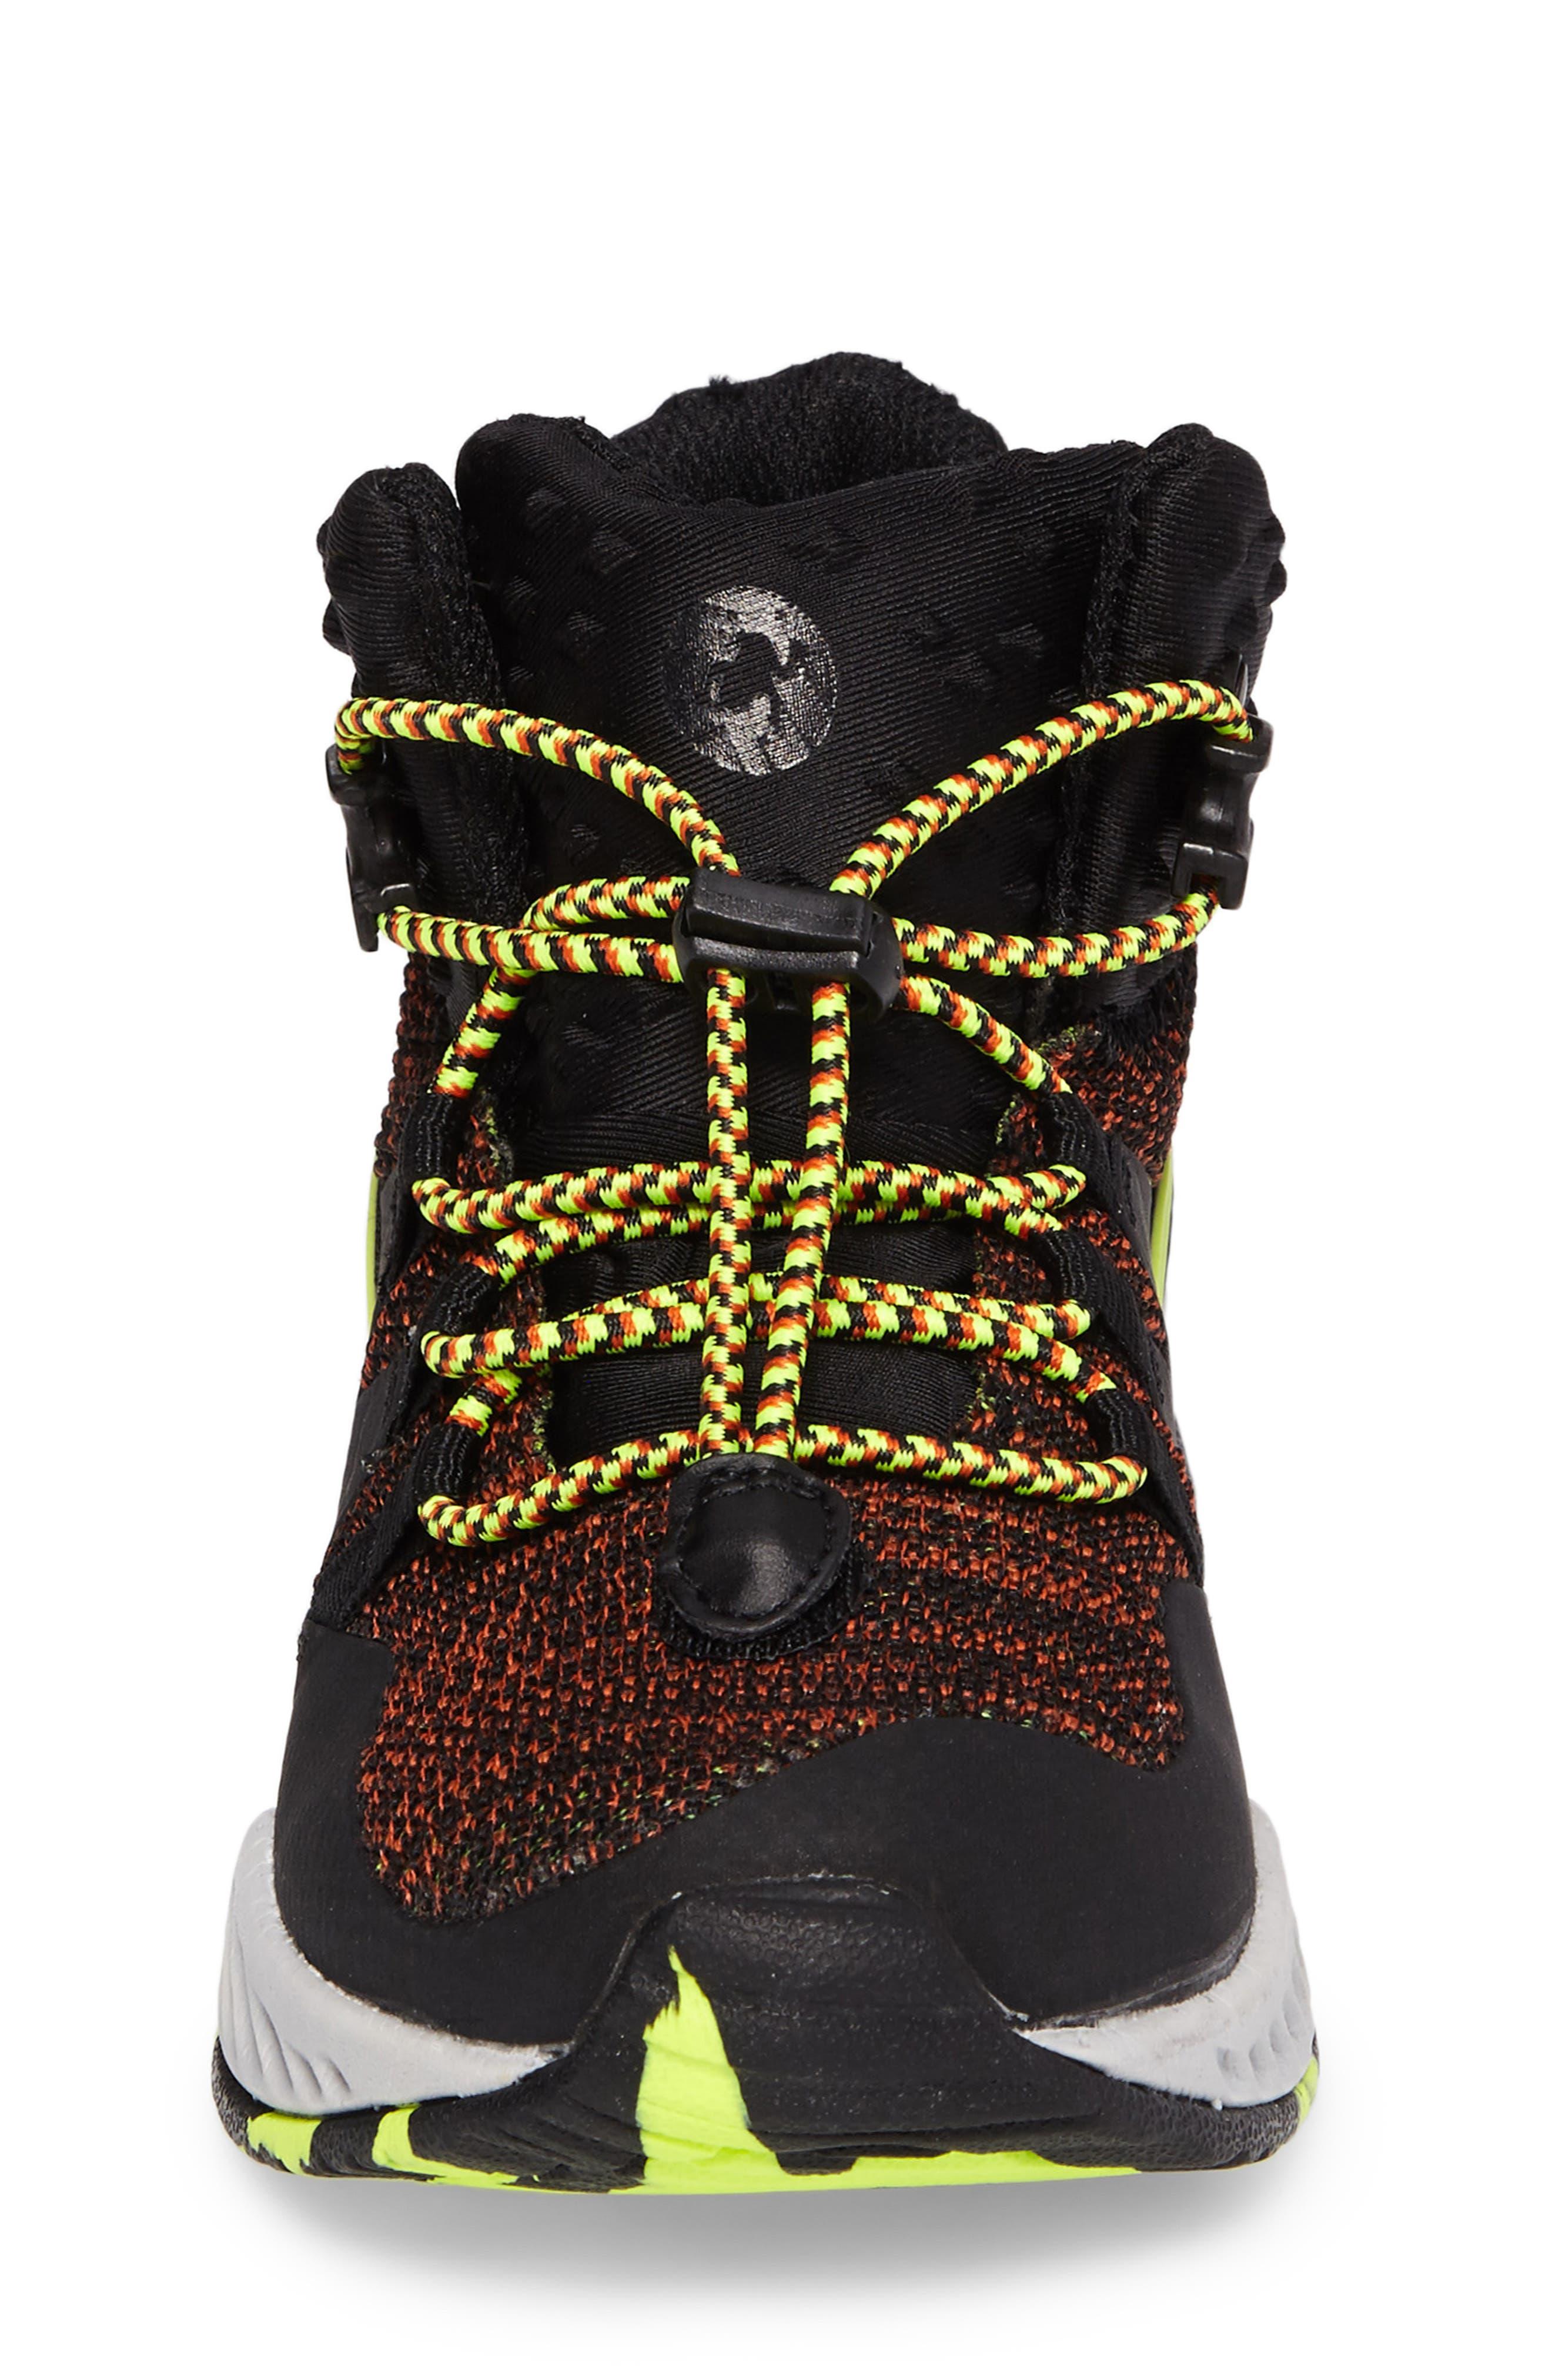 Armadillo Sneaker Boot,                             Alternate thumbnail 4, color,                             Black